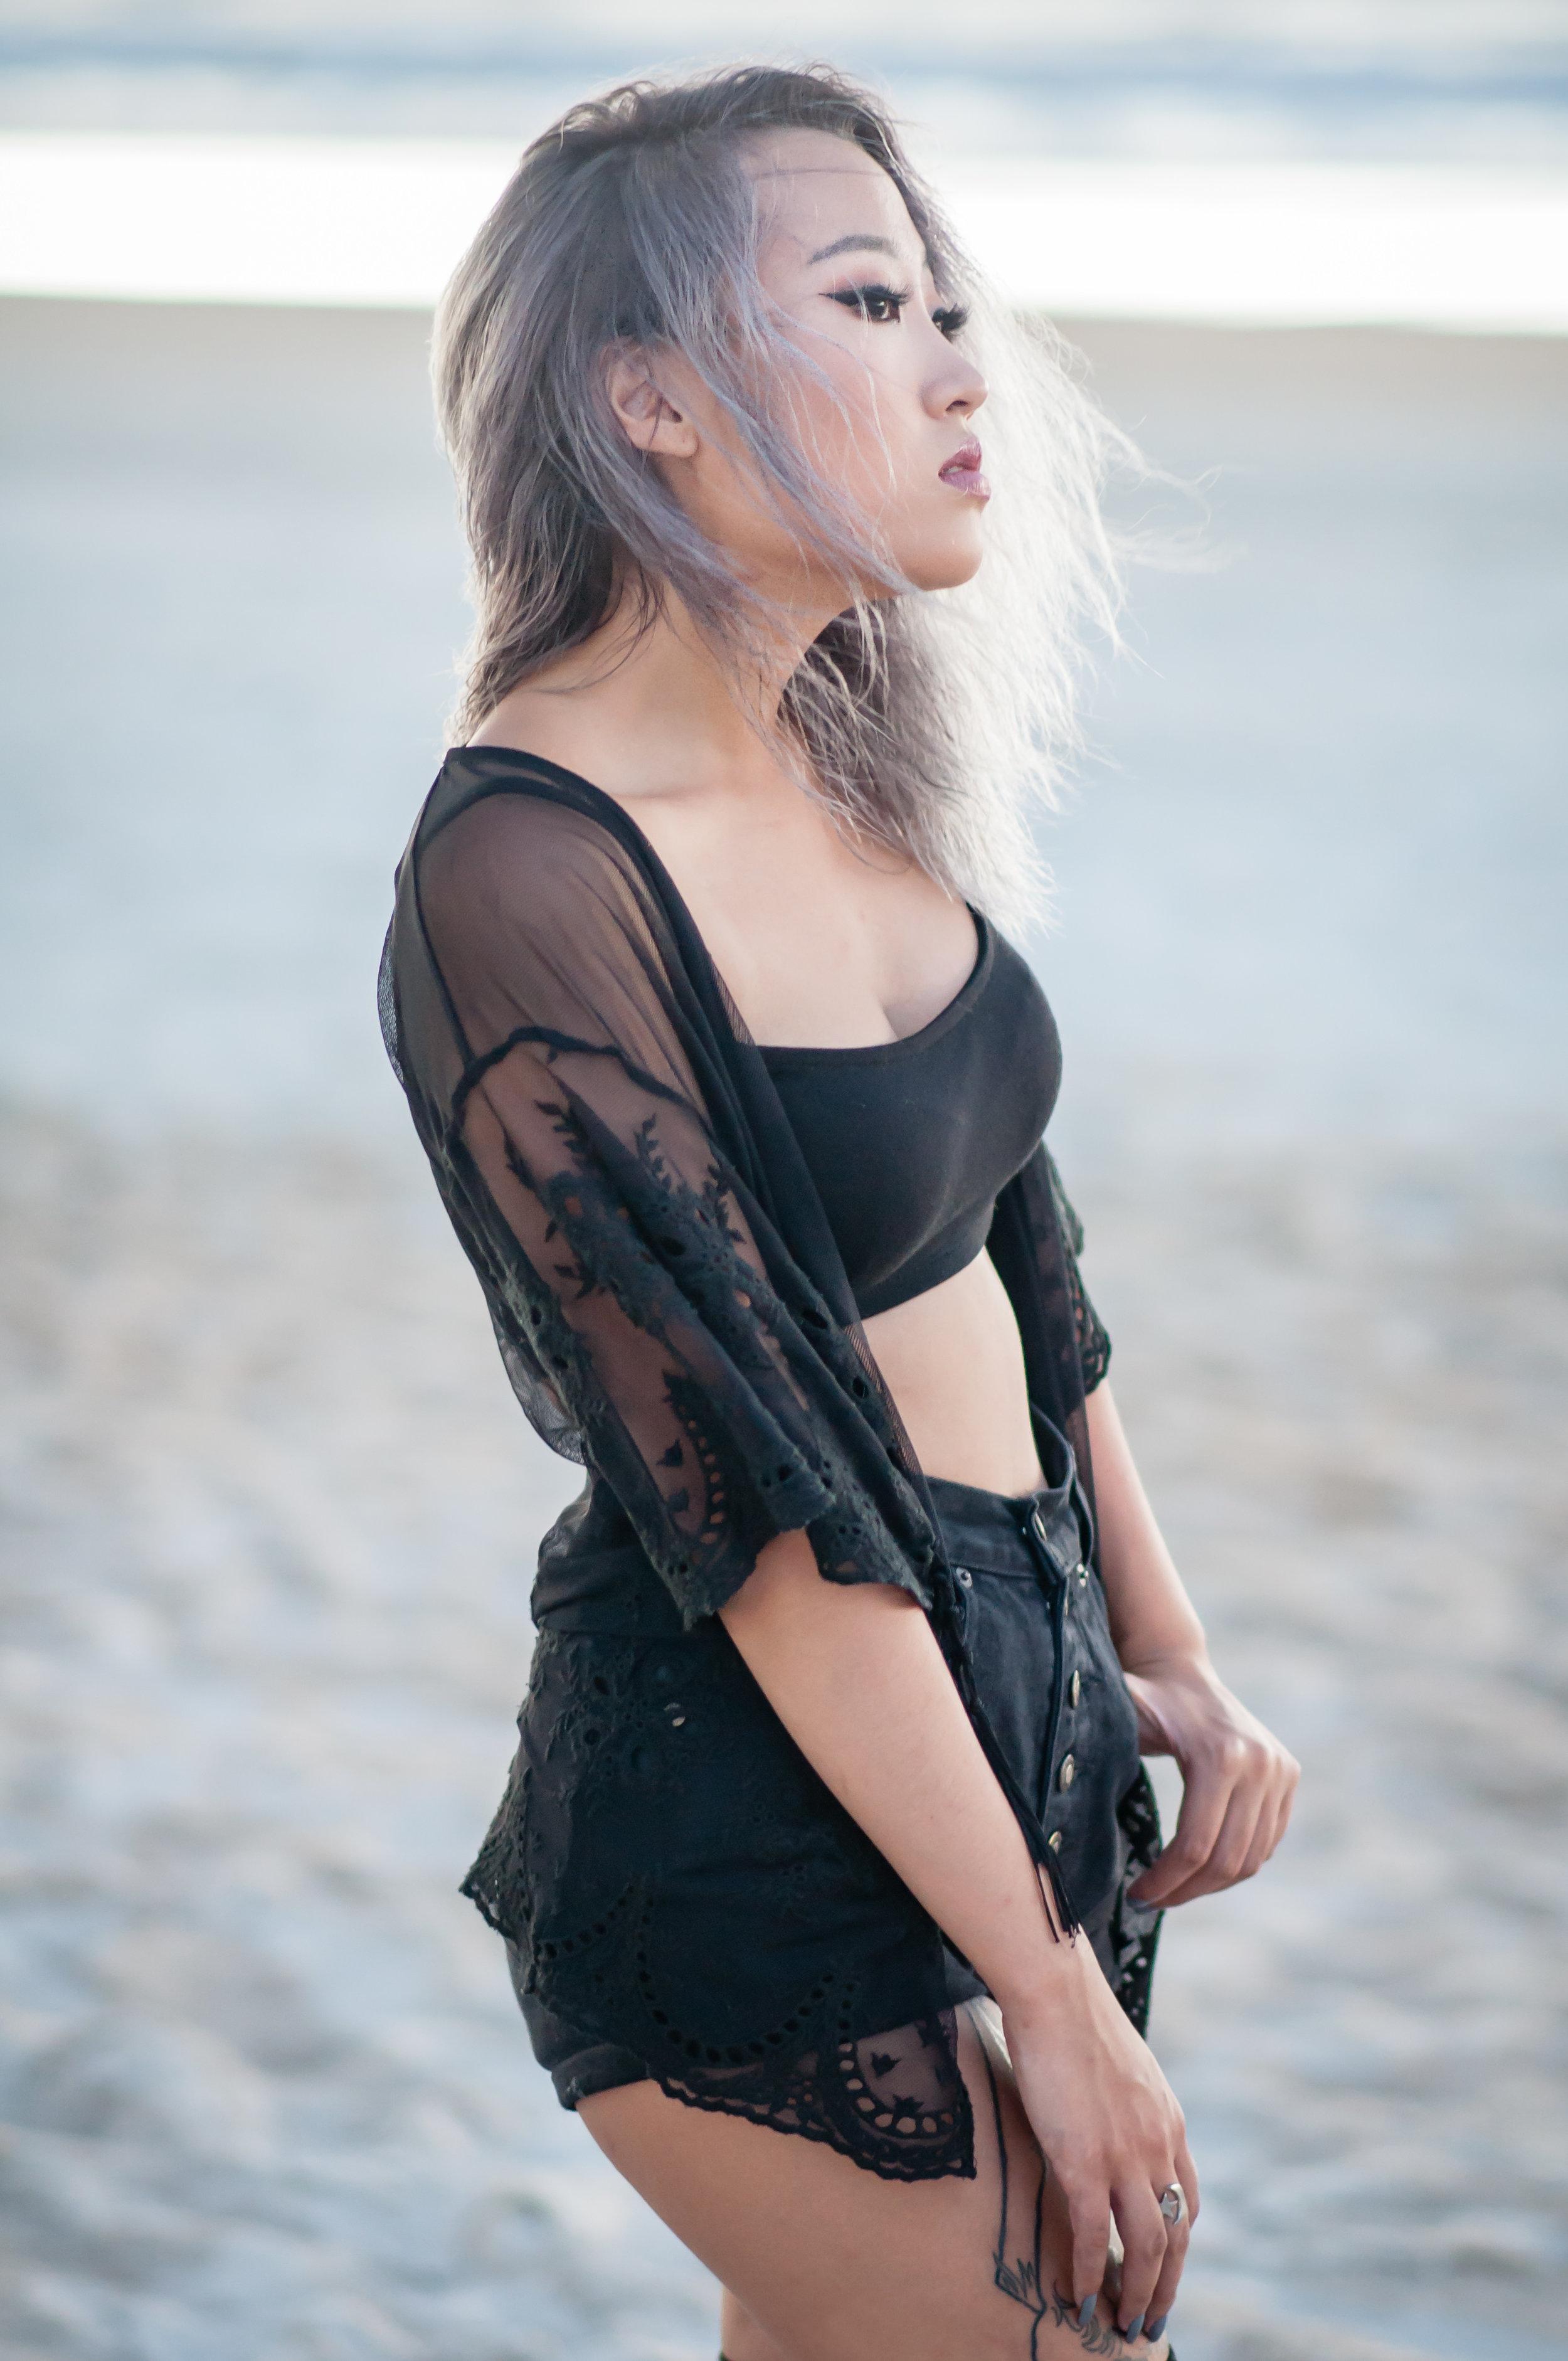 beach-fashion-photoshoot-inked-model-portraits-yanitza-ninett-palm-coast-orlando-photographer-1-5.jpg